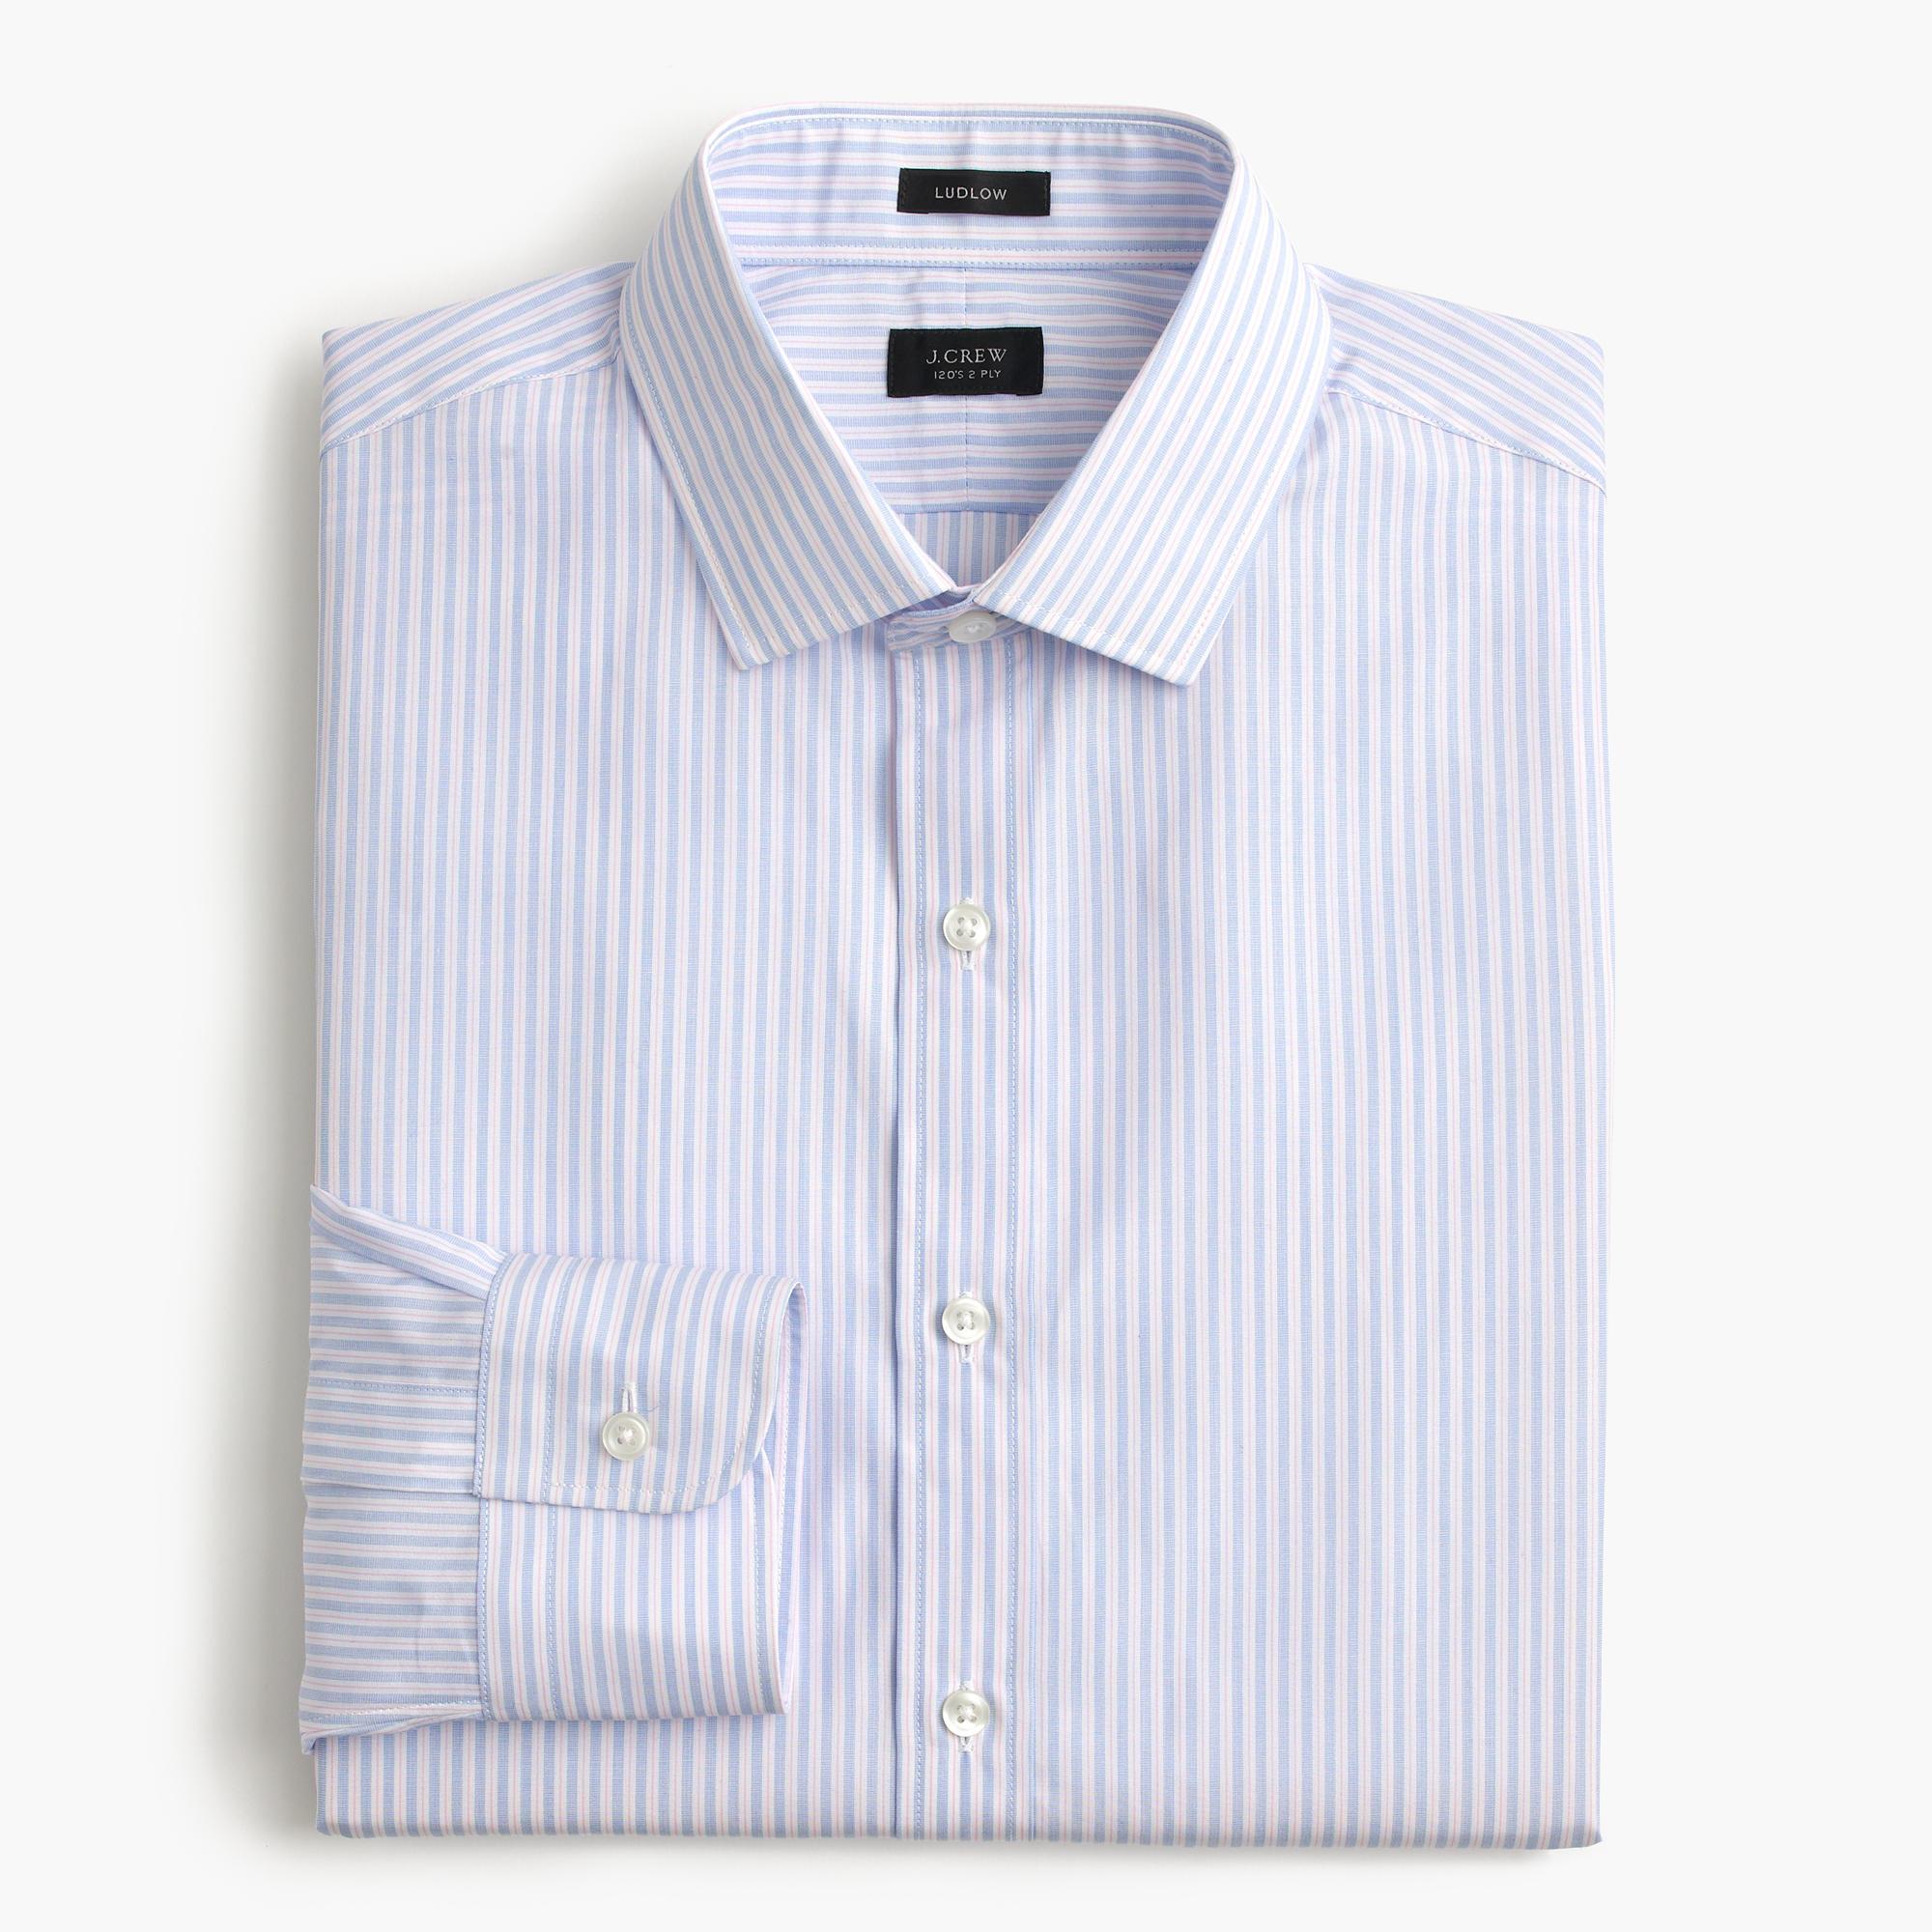 Men's Dress Shirts : Ludlow & Crosby Button-Down Shirts | J.Crew